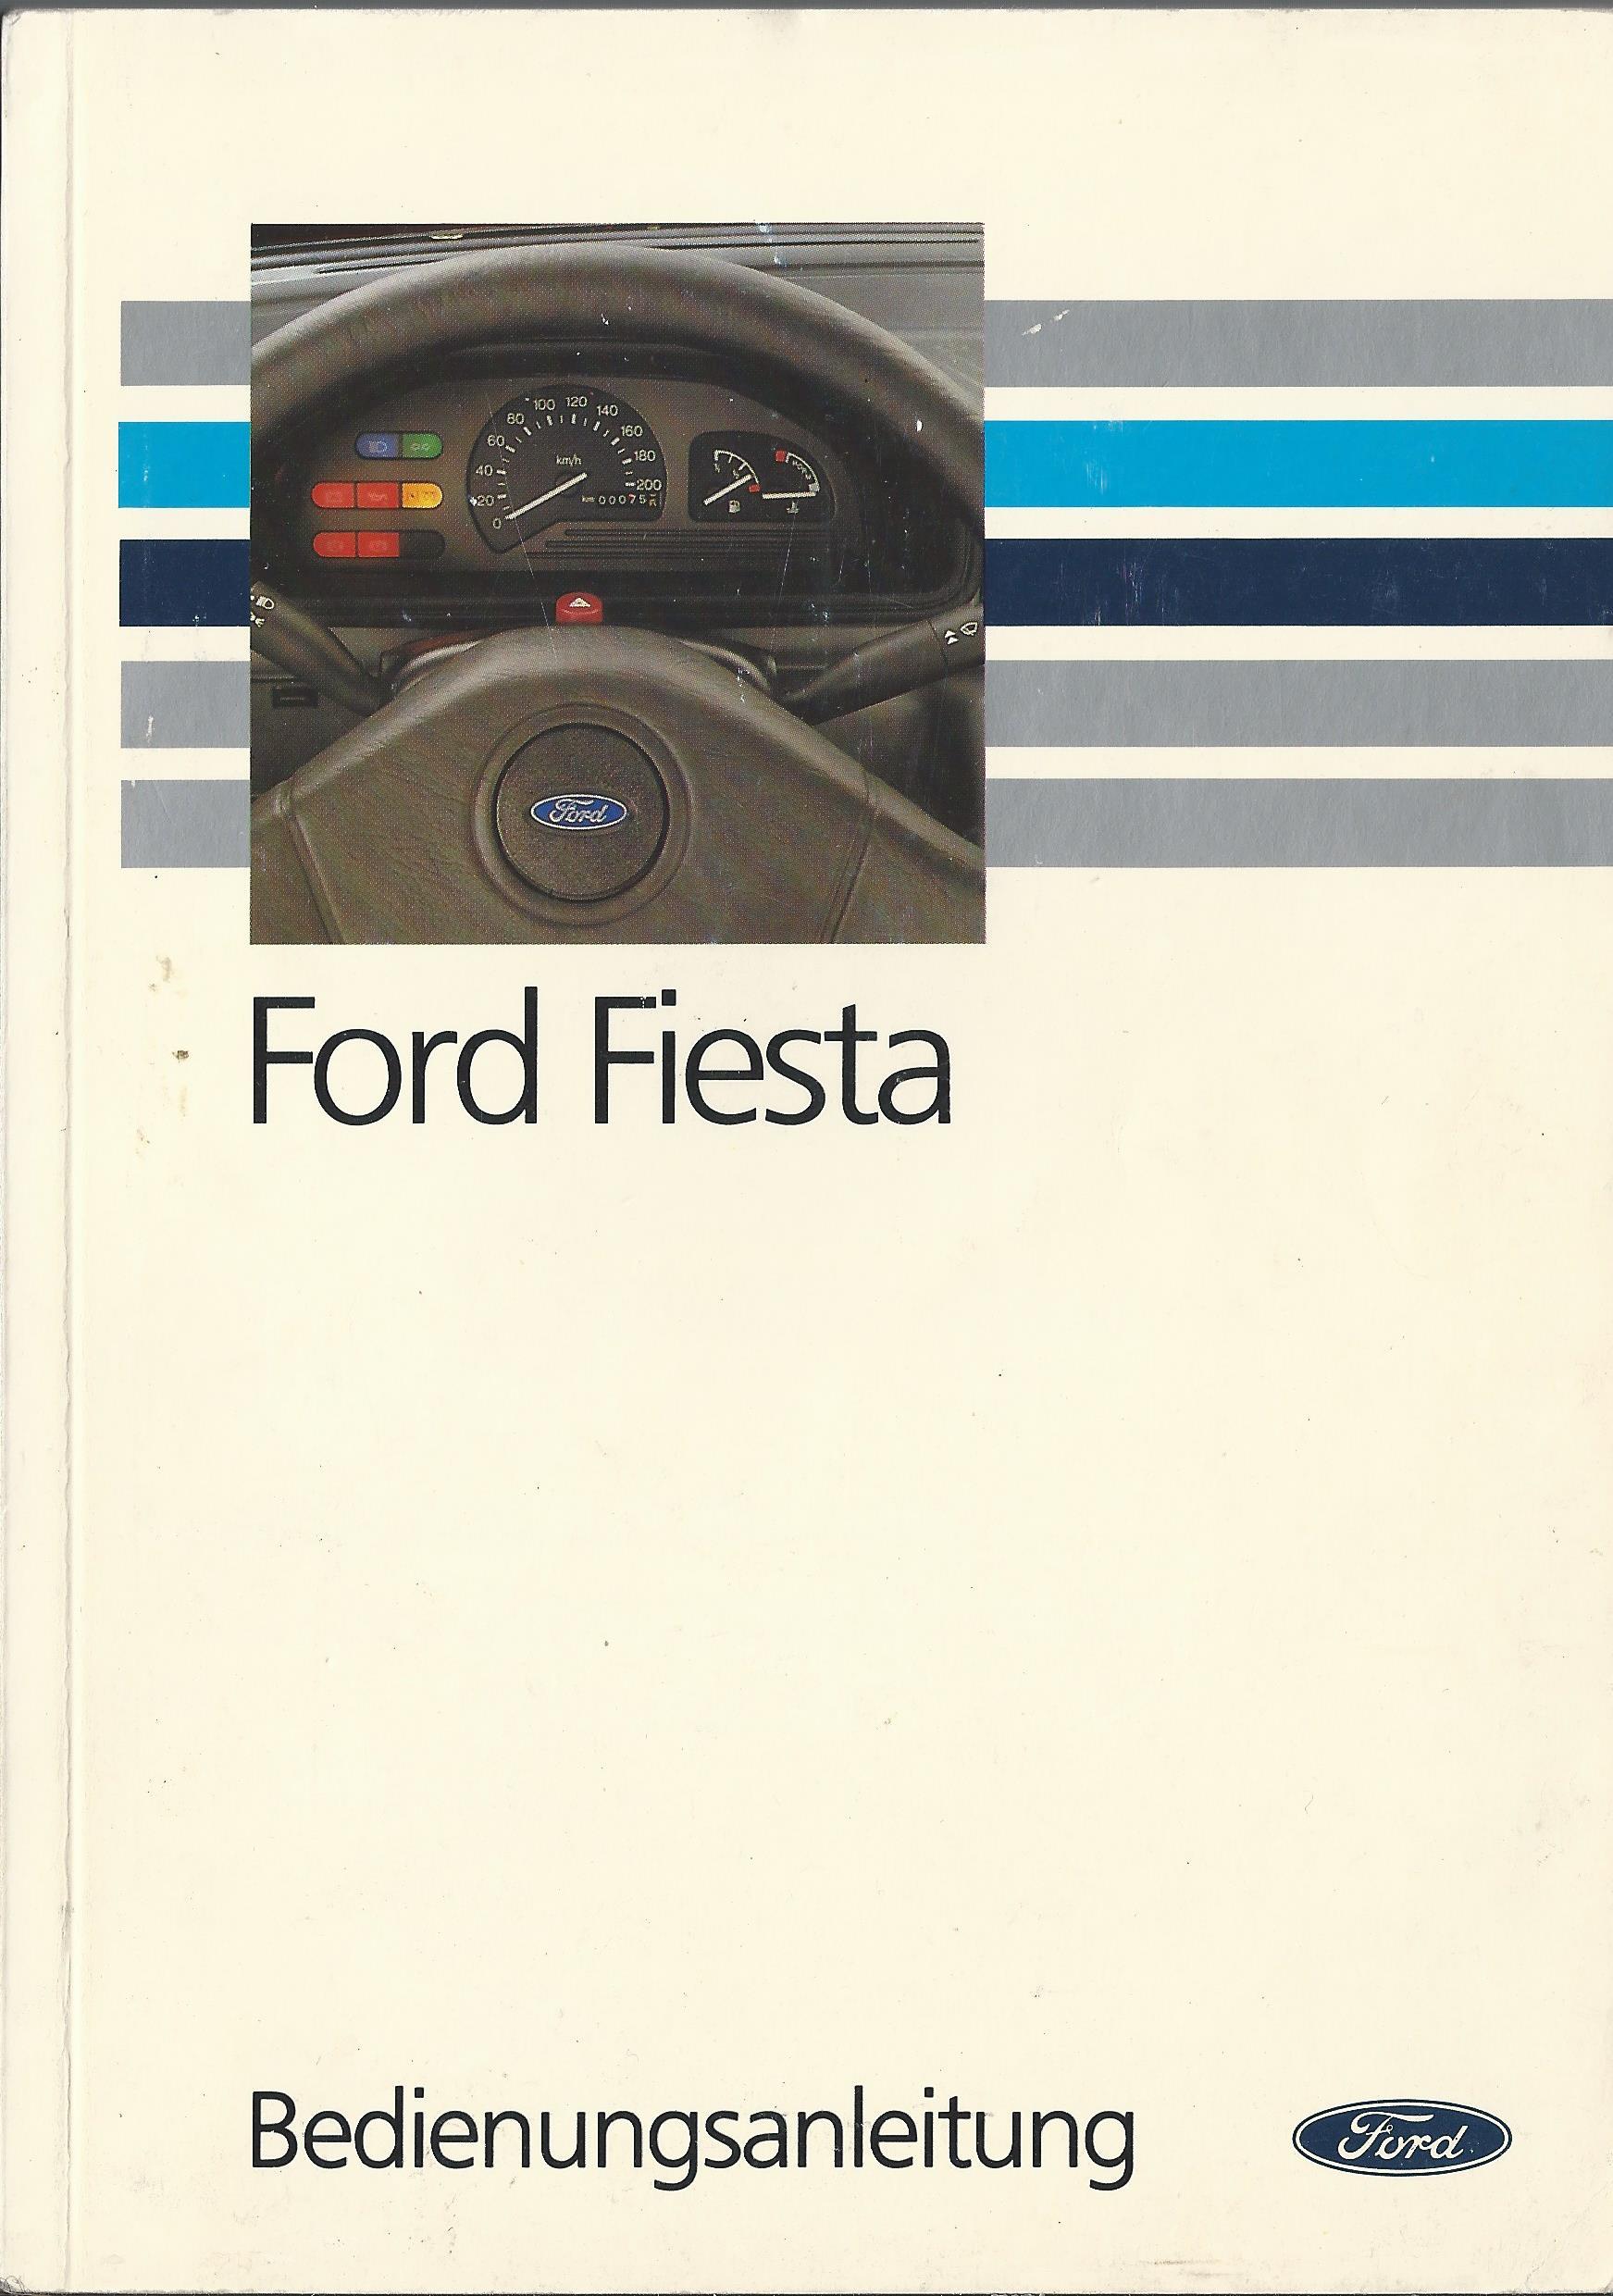 ford fiesta 3 gfj betriebsanleitung 1992 boedienungsanleitung handbuch ba ebay. Black Bedroom Furniture Sets. Home Design Ideas